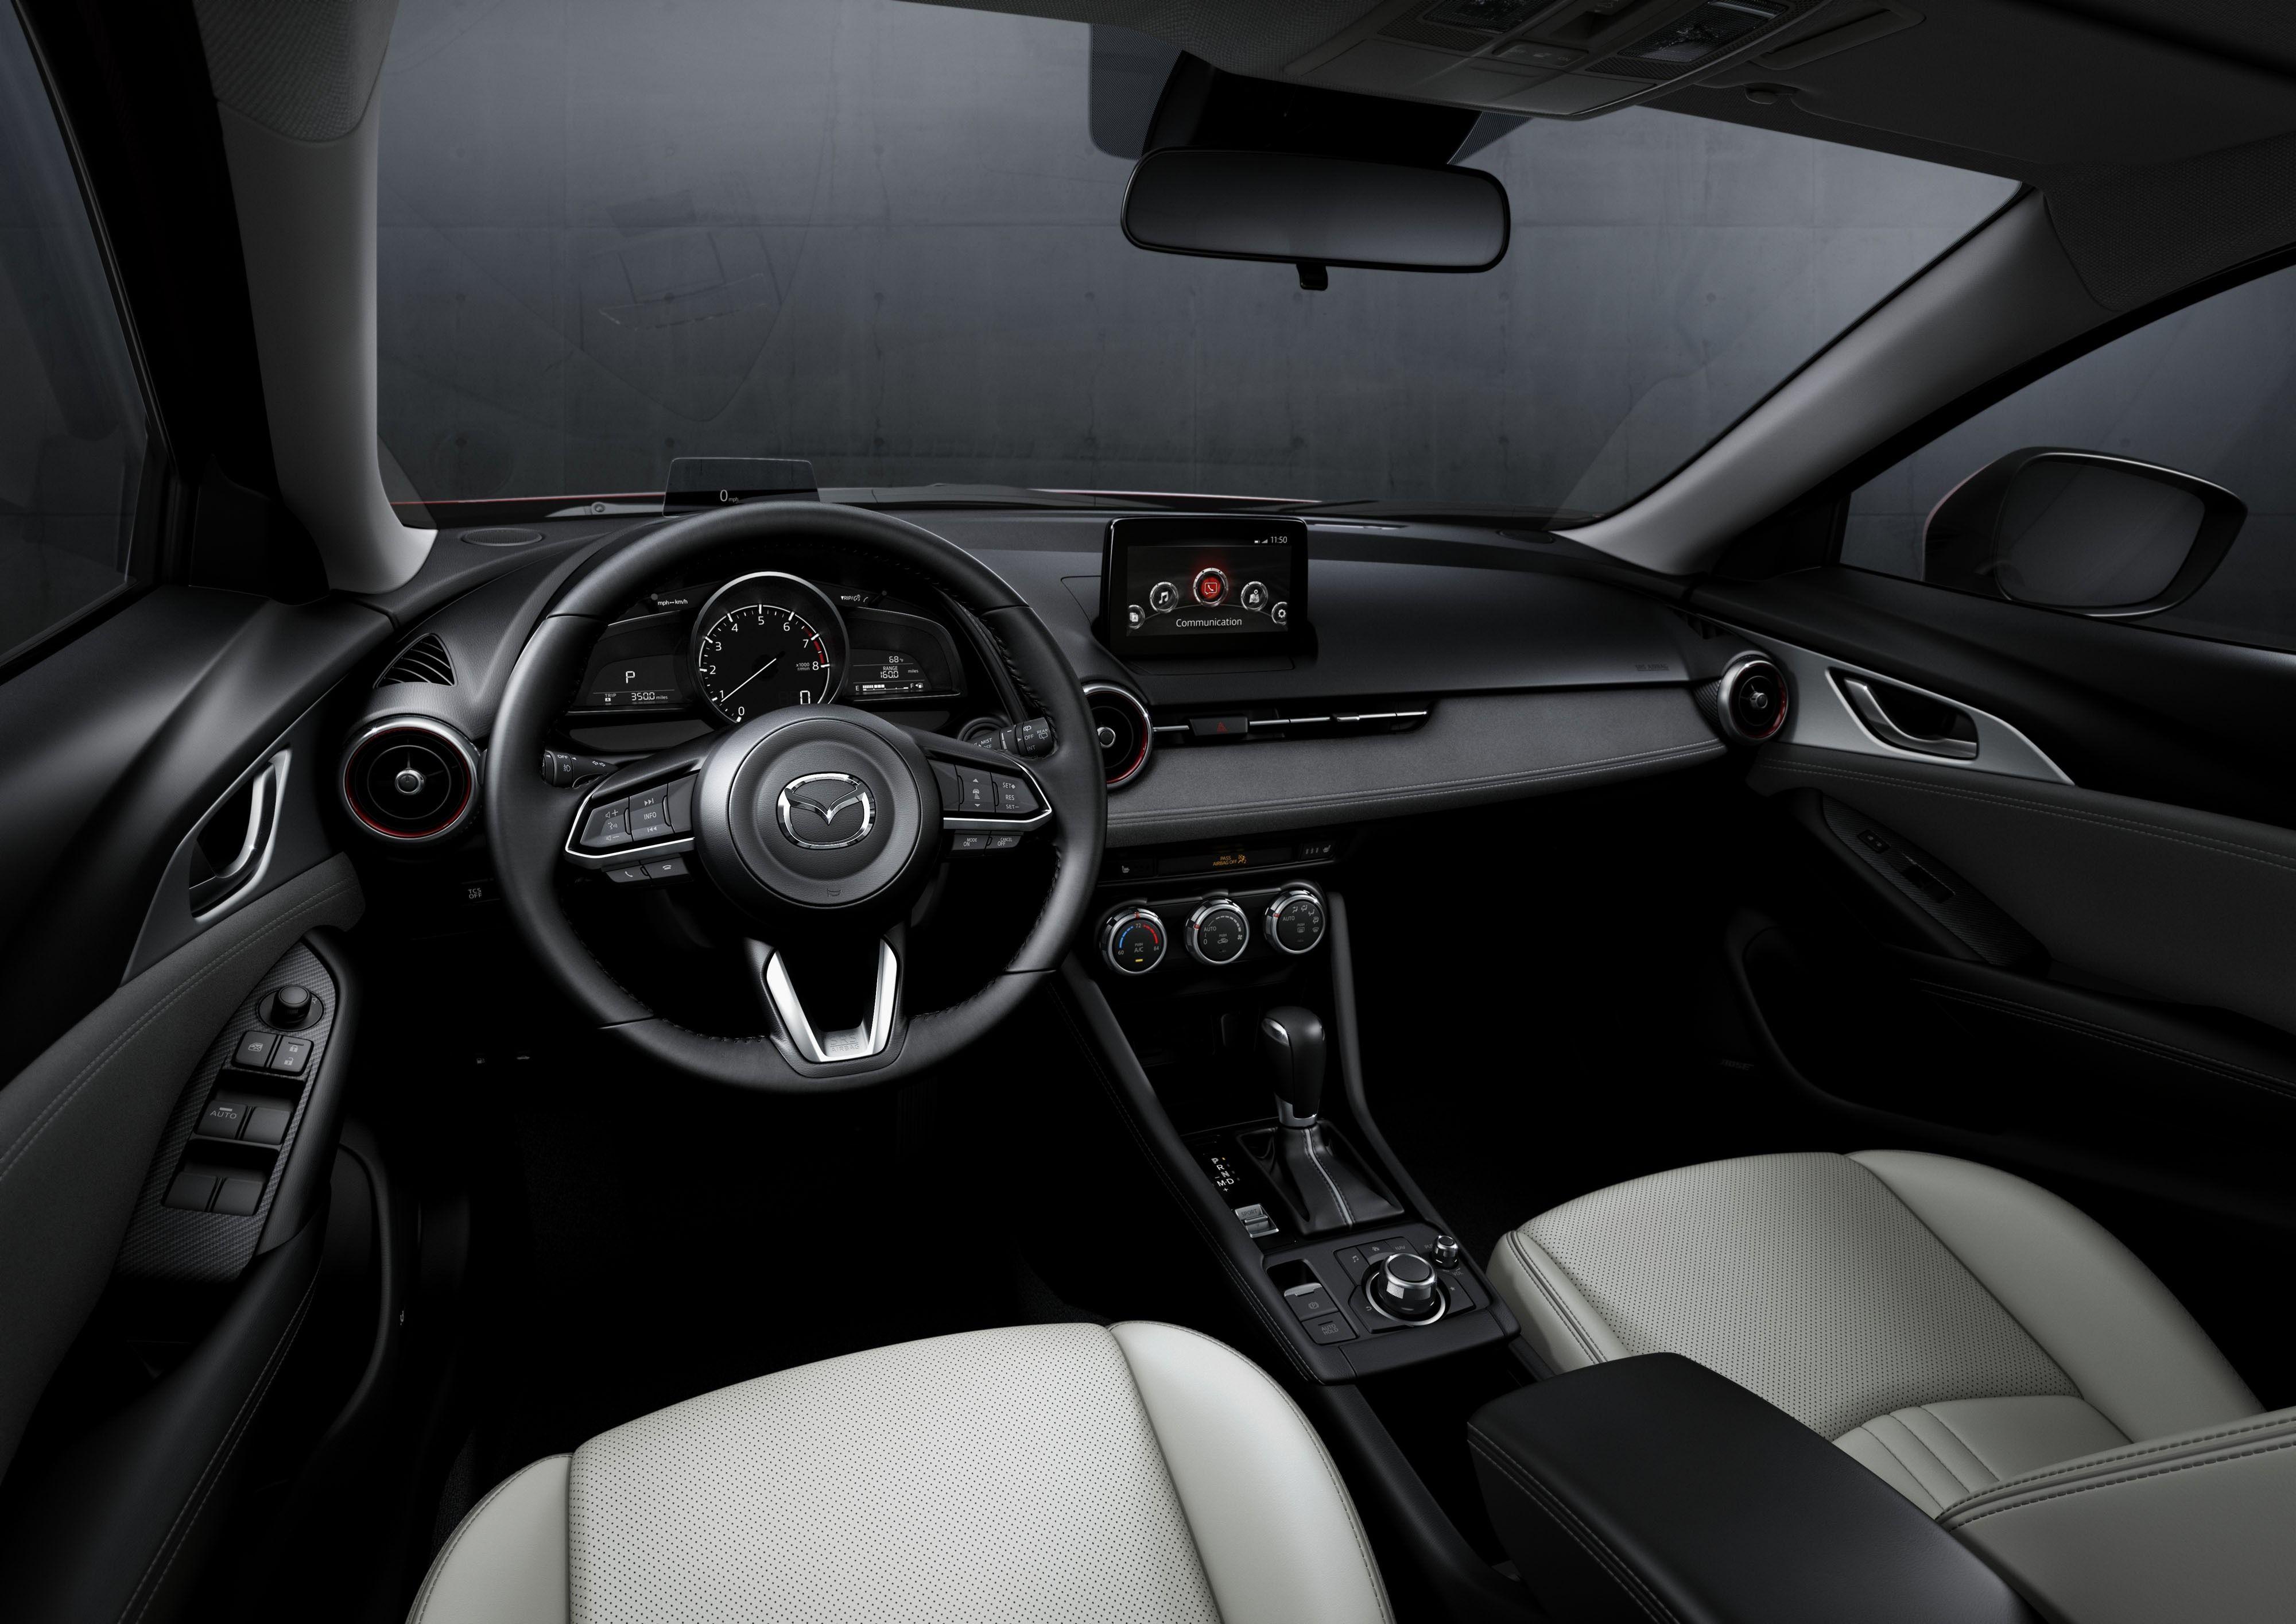 2019 Mazda Cx 3 Picture Release Date And Review Mazda Mazda Cx3 Car Review